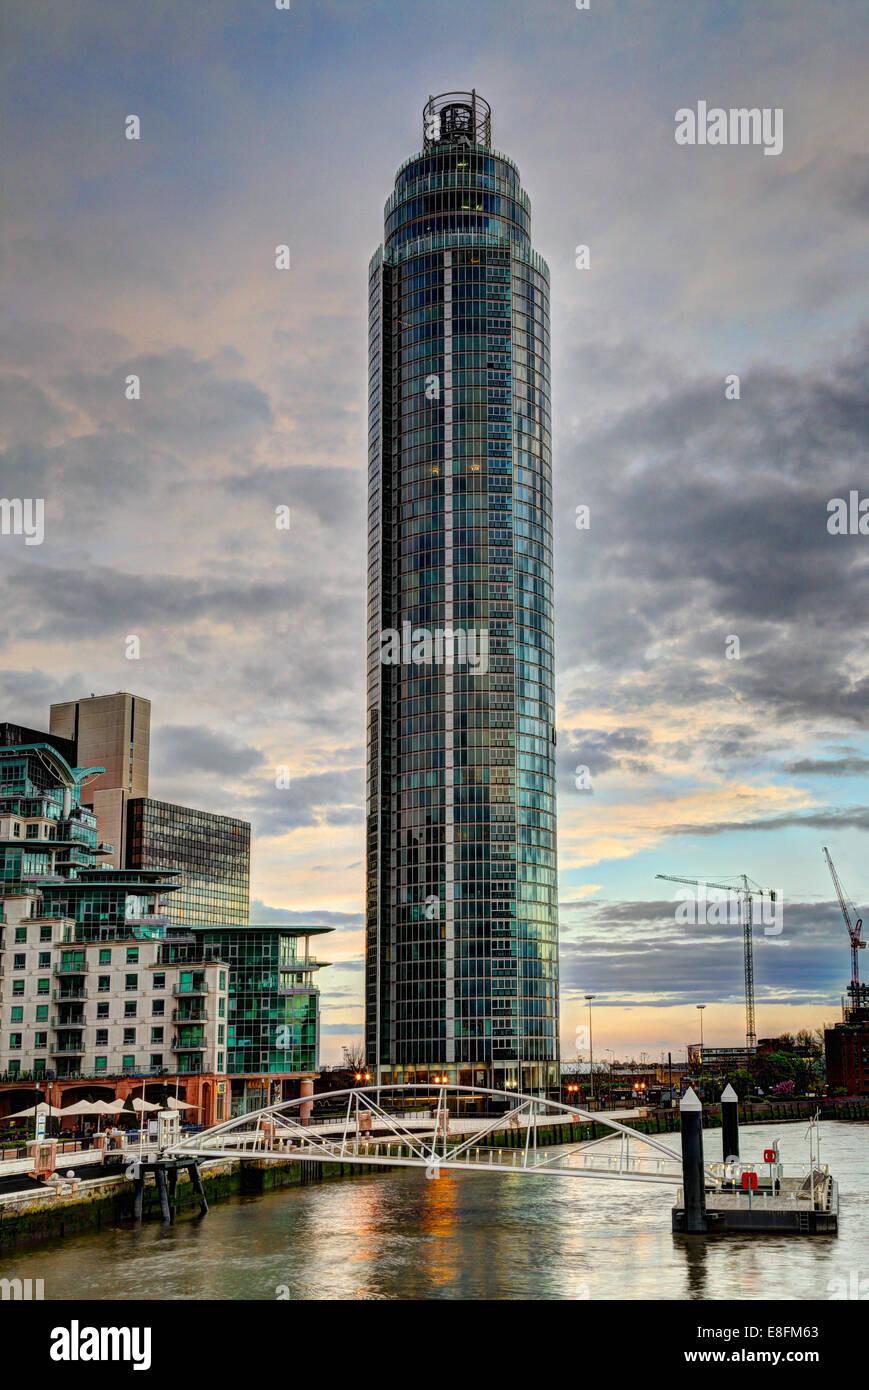 London, UK Vauxhall Tower - Stock Image